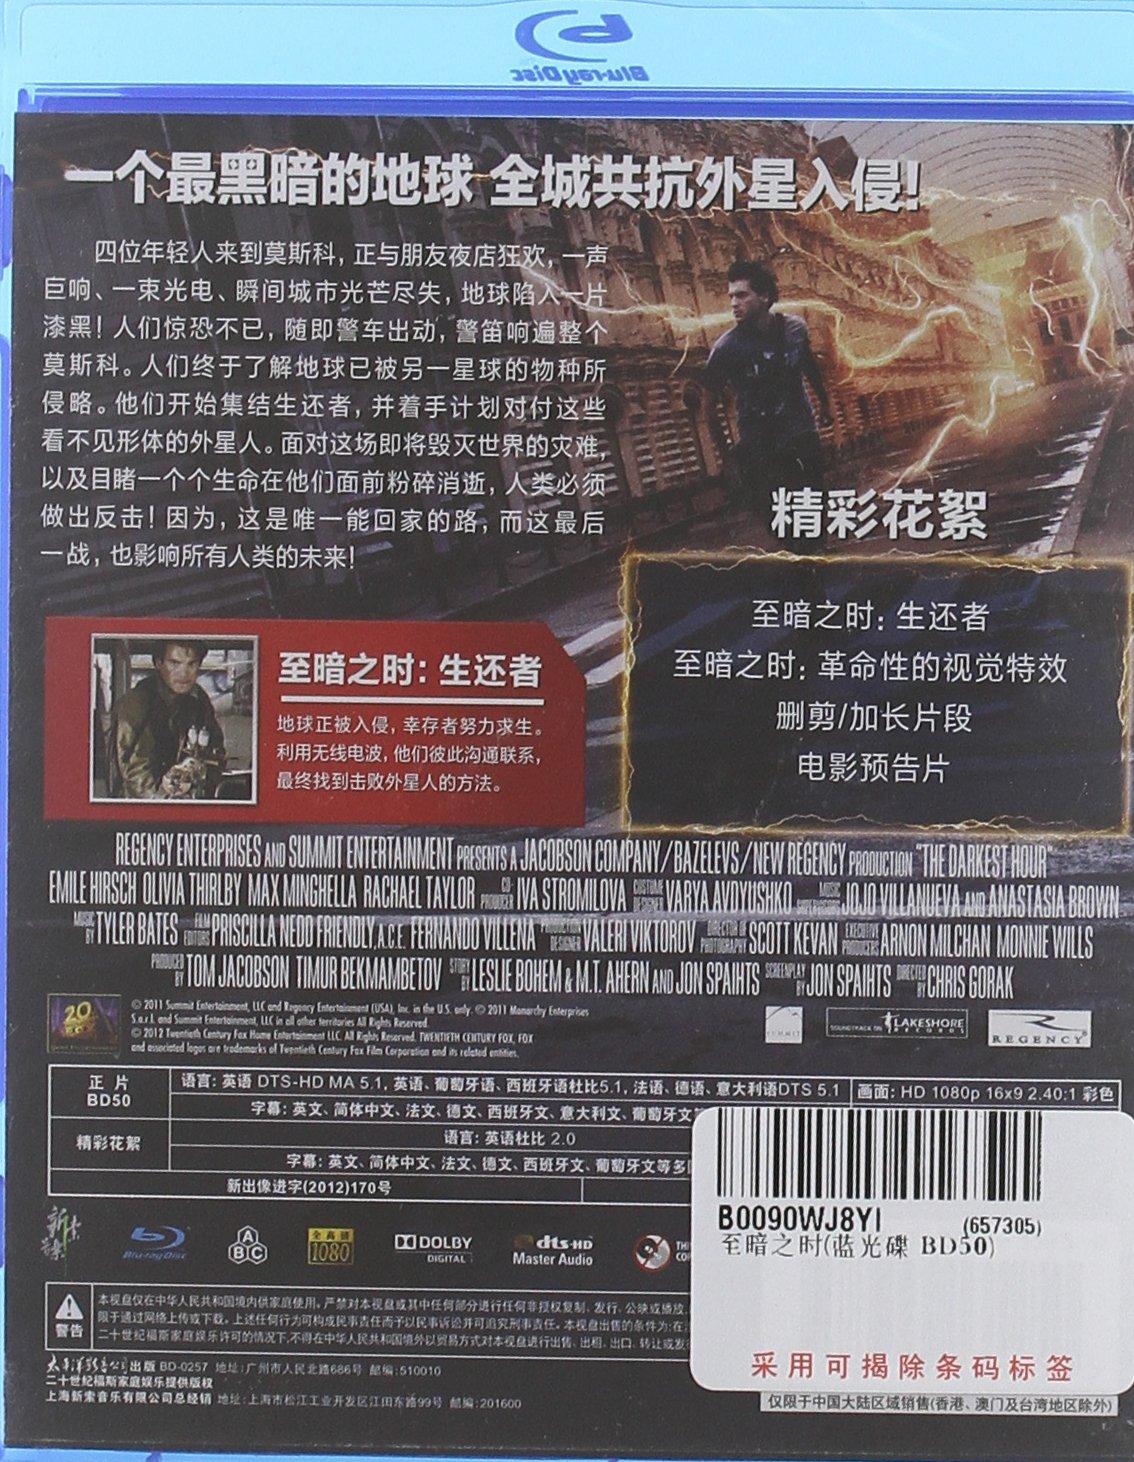 Amazon.com: 至暗之时(蓝光碟 BD50): Cine y TV